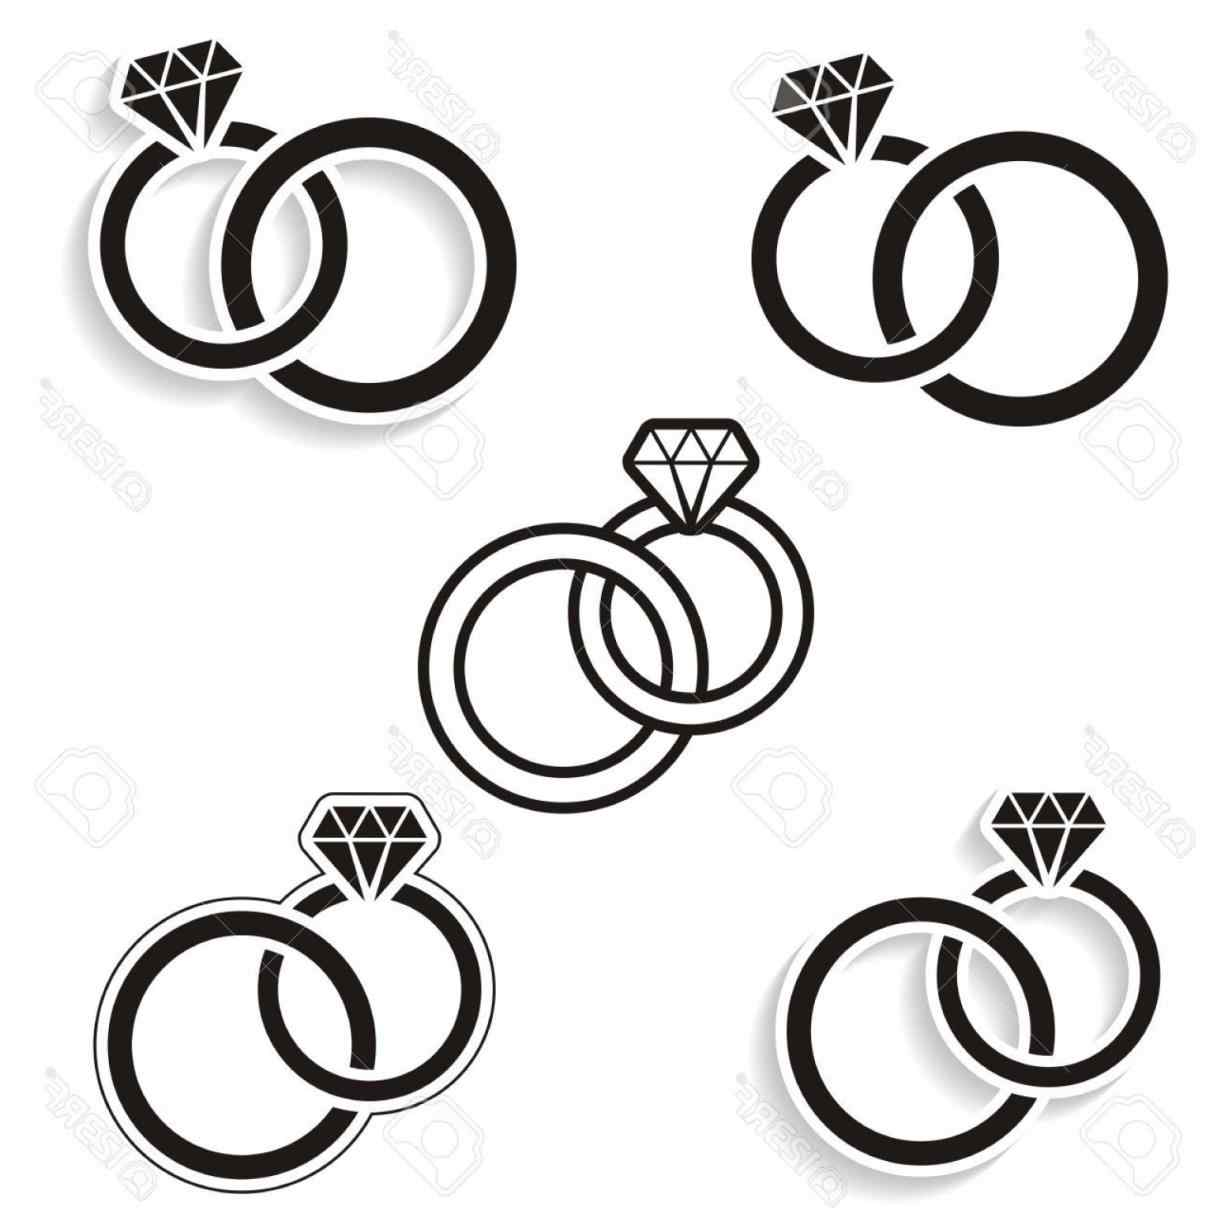 1232x1232 Claddagh Ring Drawing